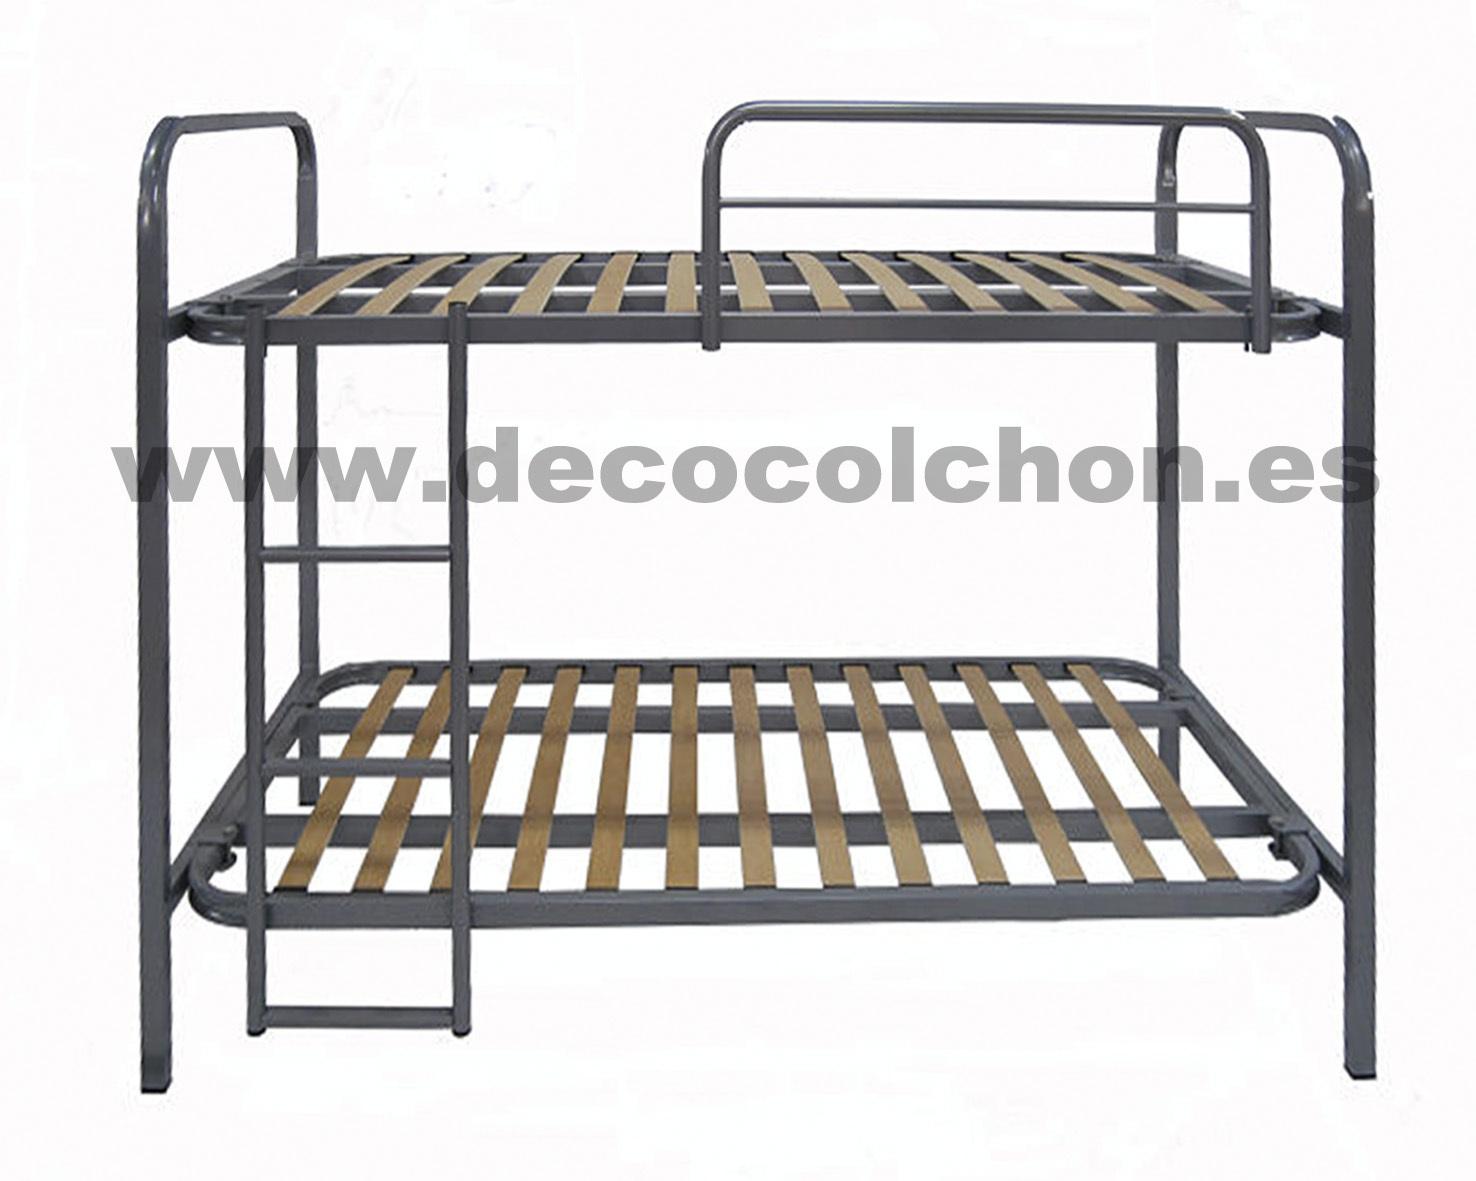 Litera andorra somieres bases canap s camas y colchones for Camas 110x200